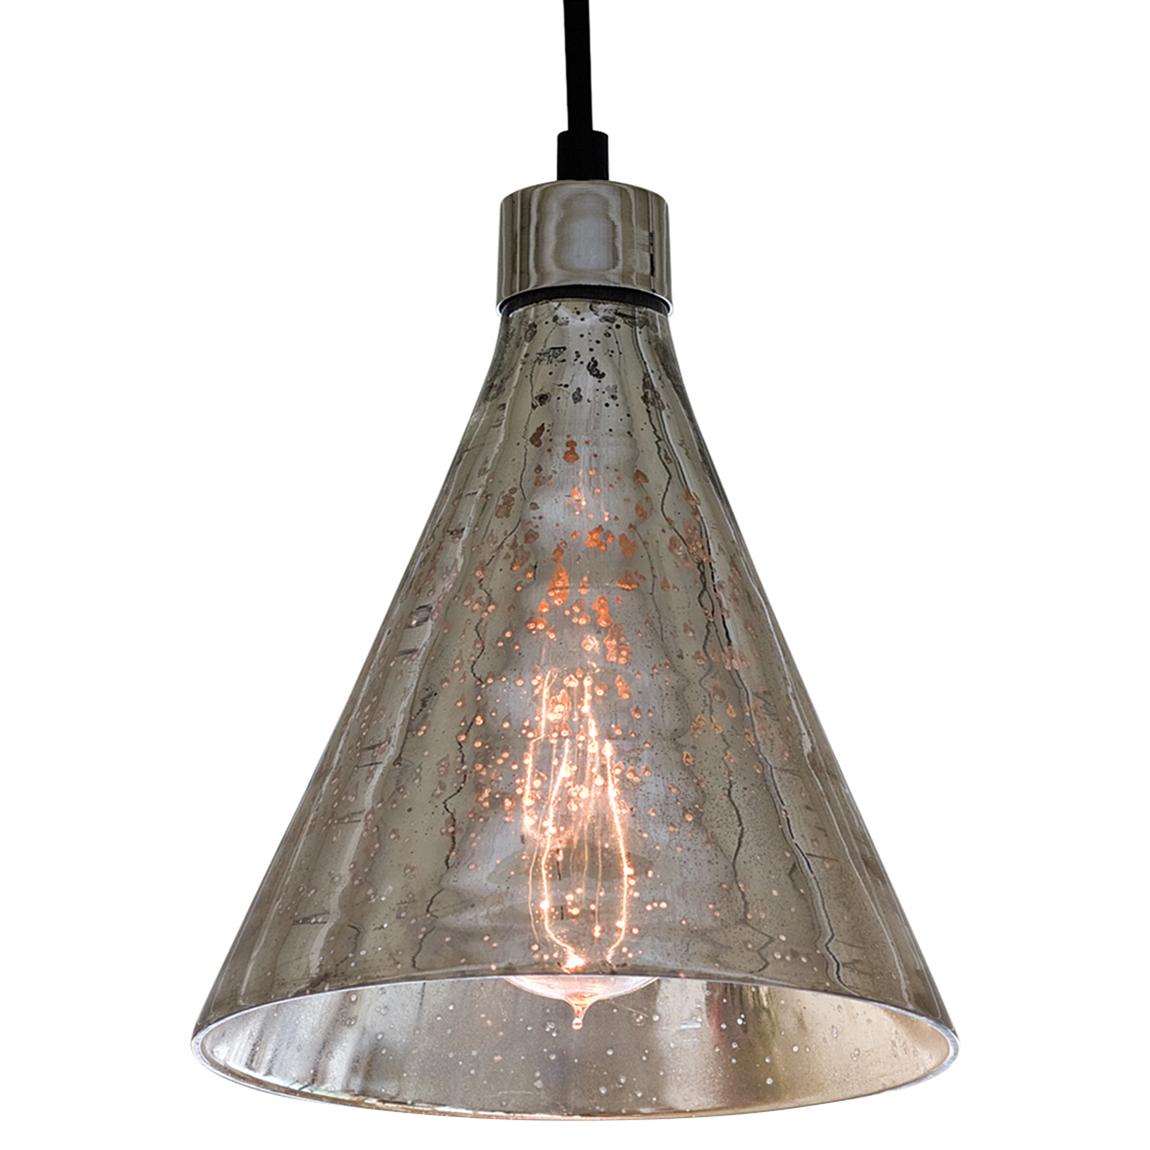 Motte Industrial Loft Antique Mercury Glass Beaker Pendant